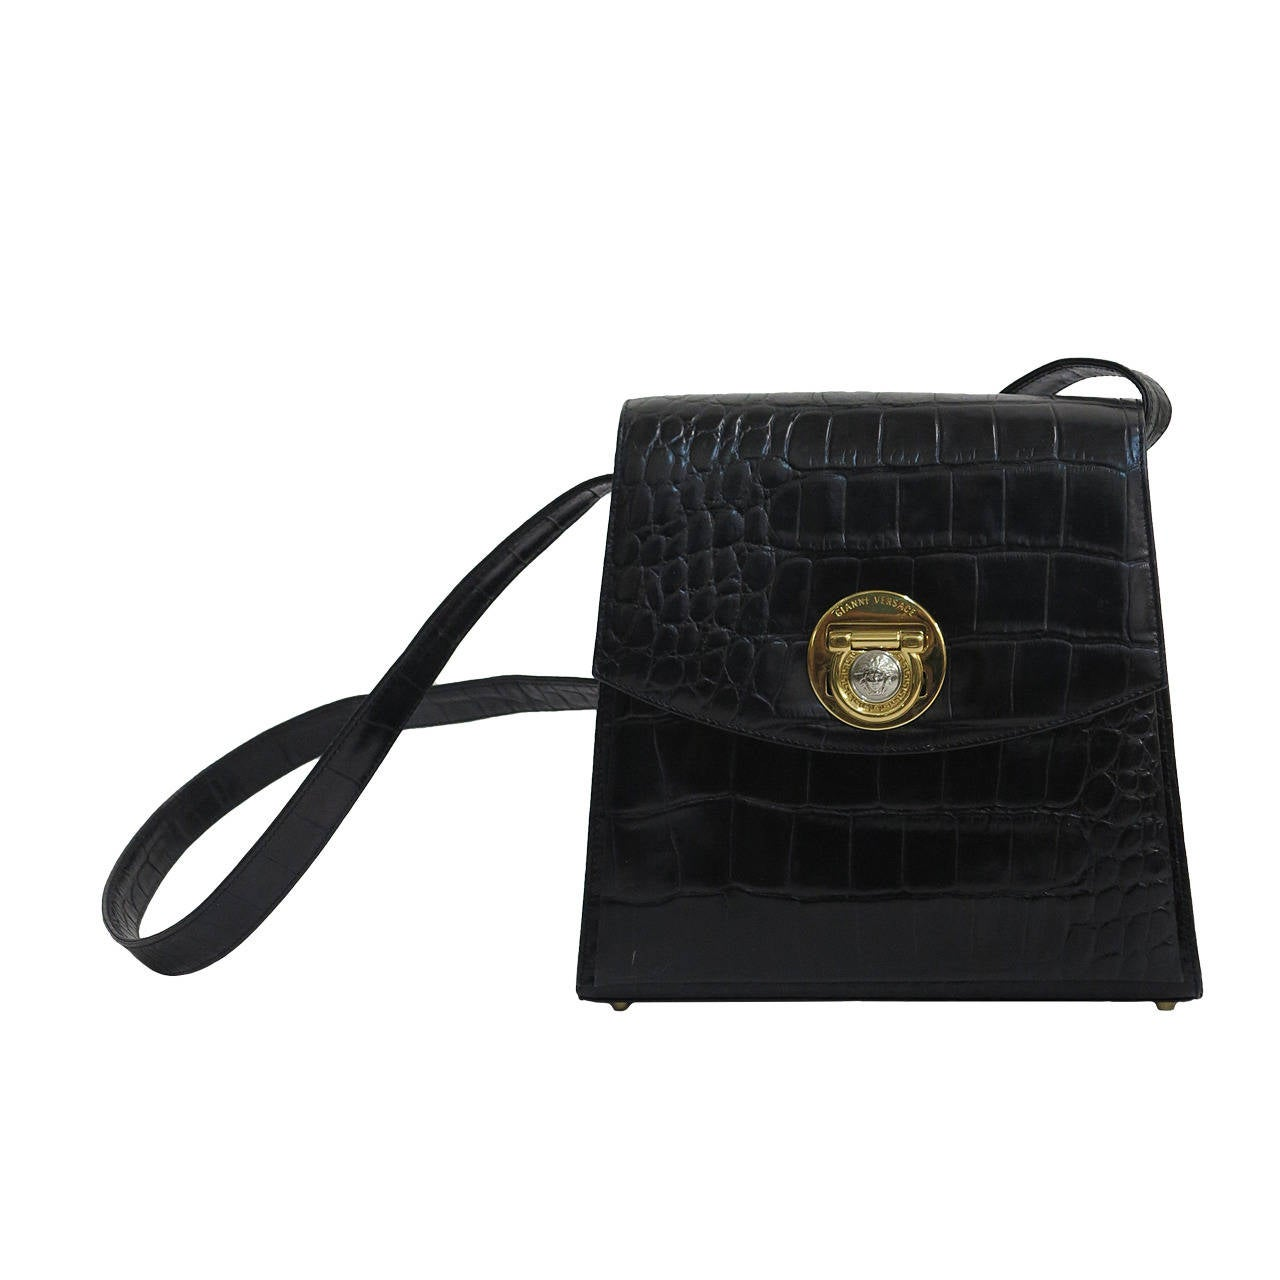 Versace Medusa black alligator embossed leather hand bag For Sale at ... 38e03061735e3